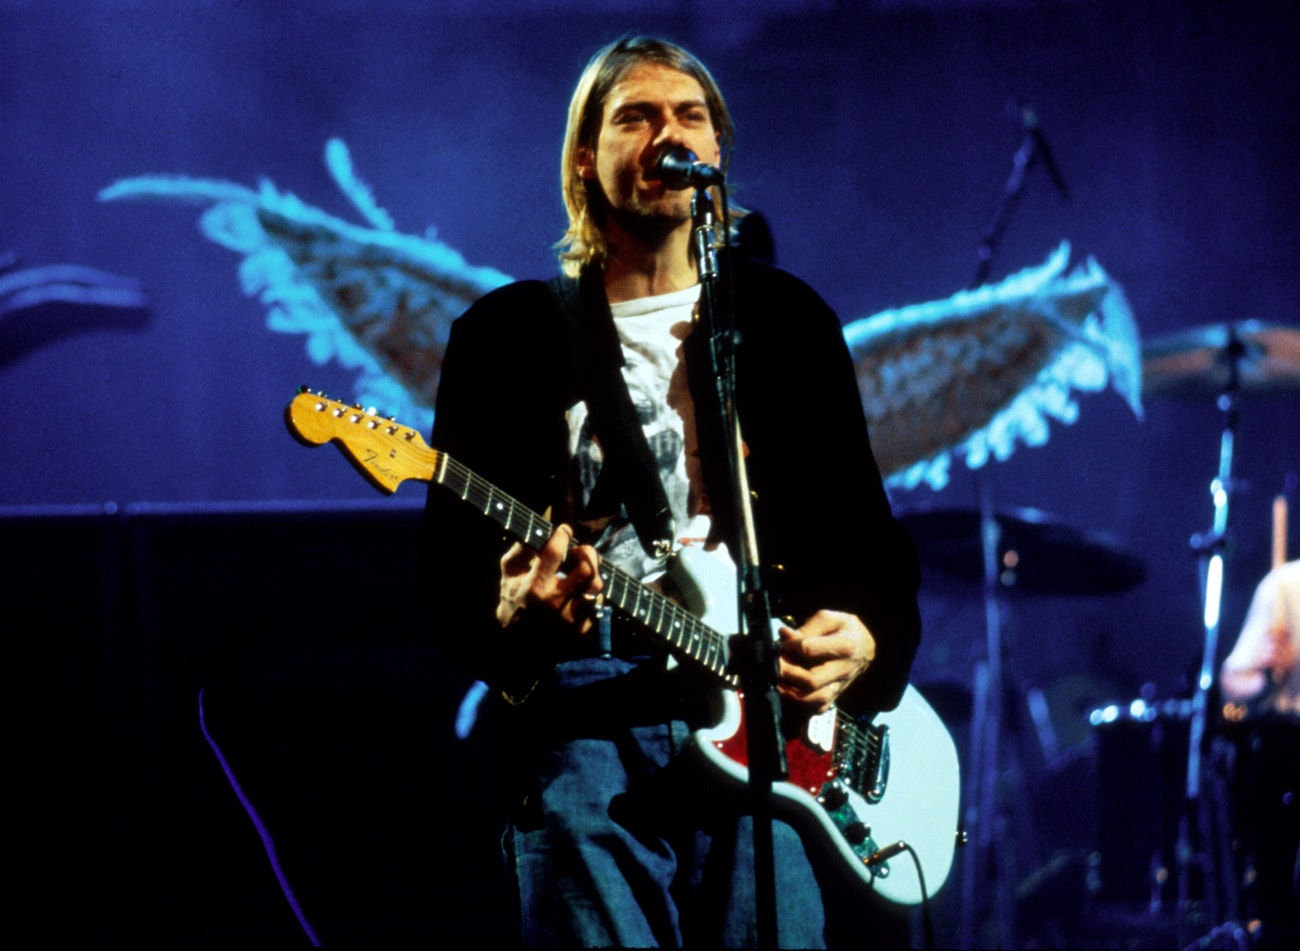 Kurt Cobain na koncertu MTV Live and Loud, prosinec 1993